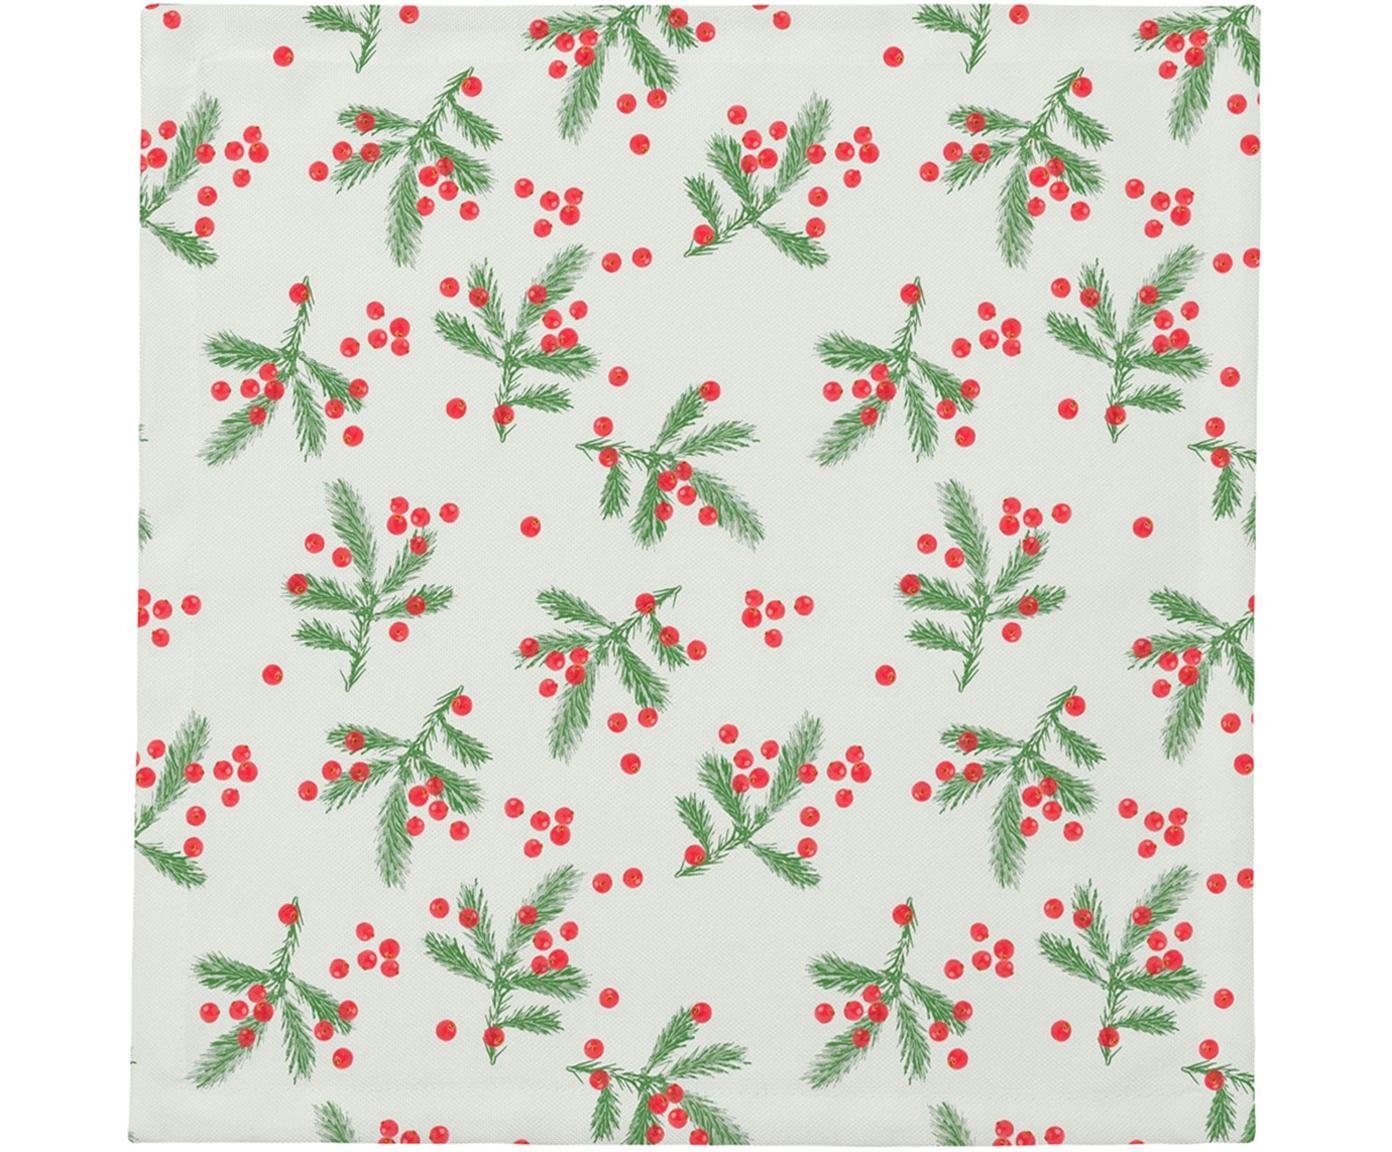 Servilletas de tela Christmas Berries, 4uds., Algodón, Rojo, verde, An 40 x L 40 cm